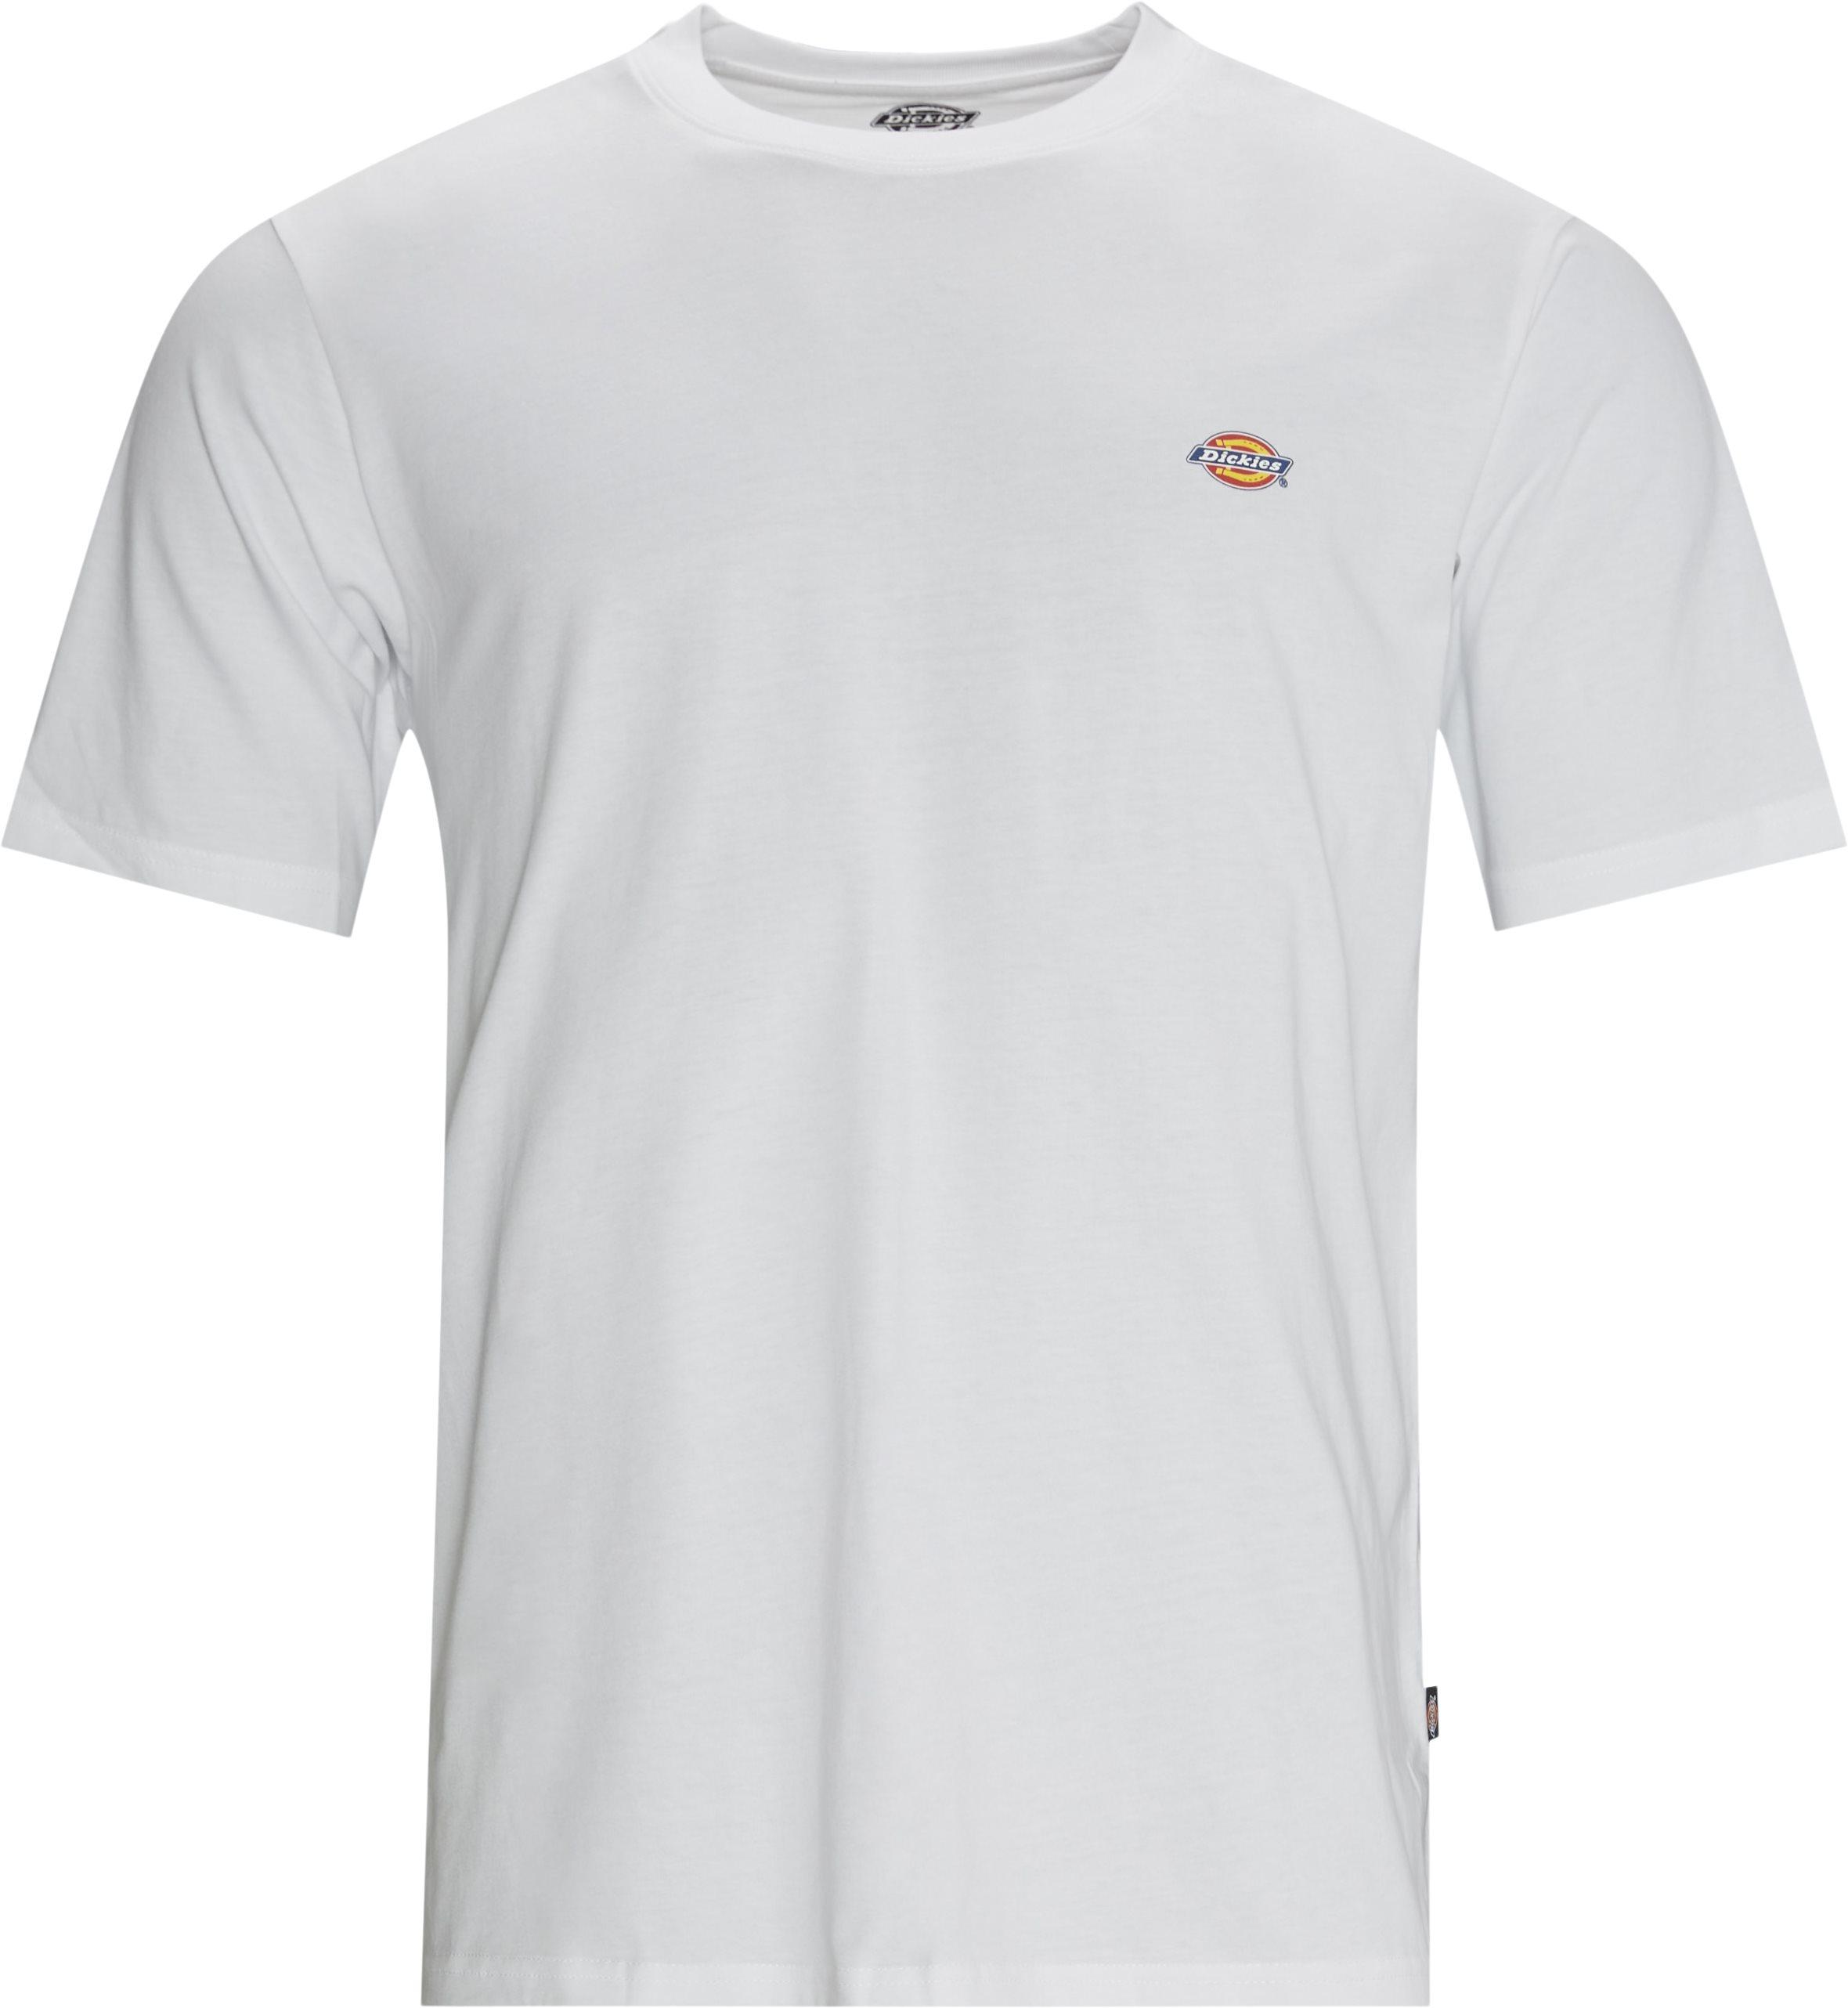 SS Mapleton Tee - T-shirts - Regular fit - Vit